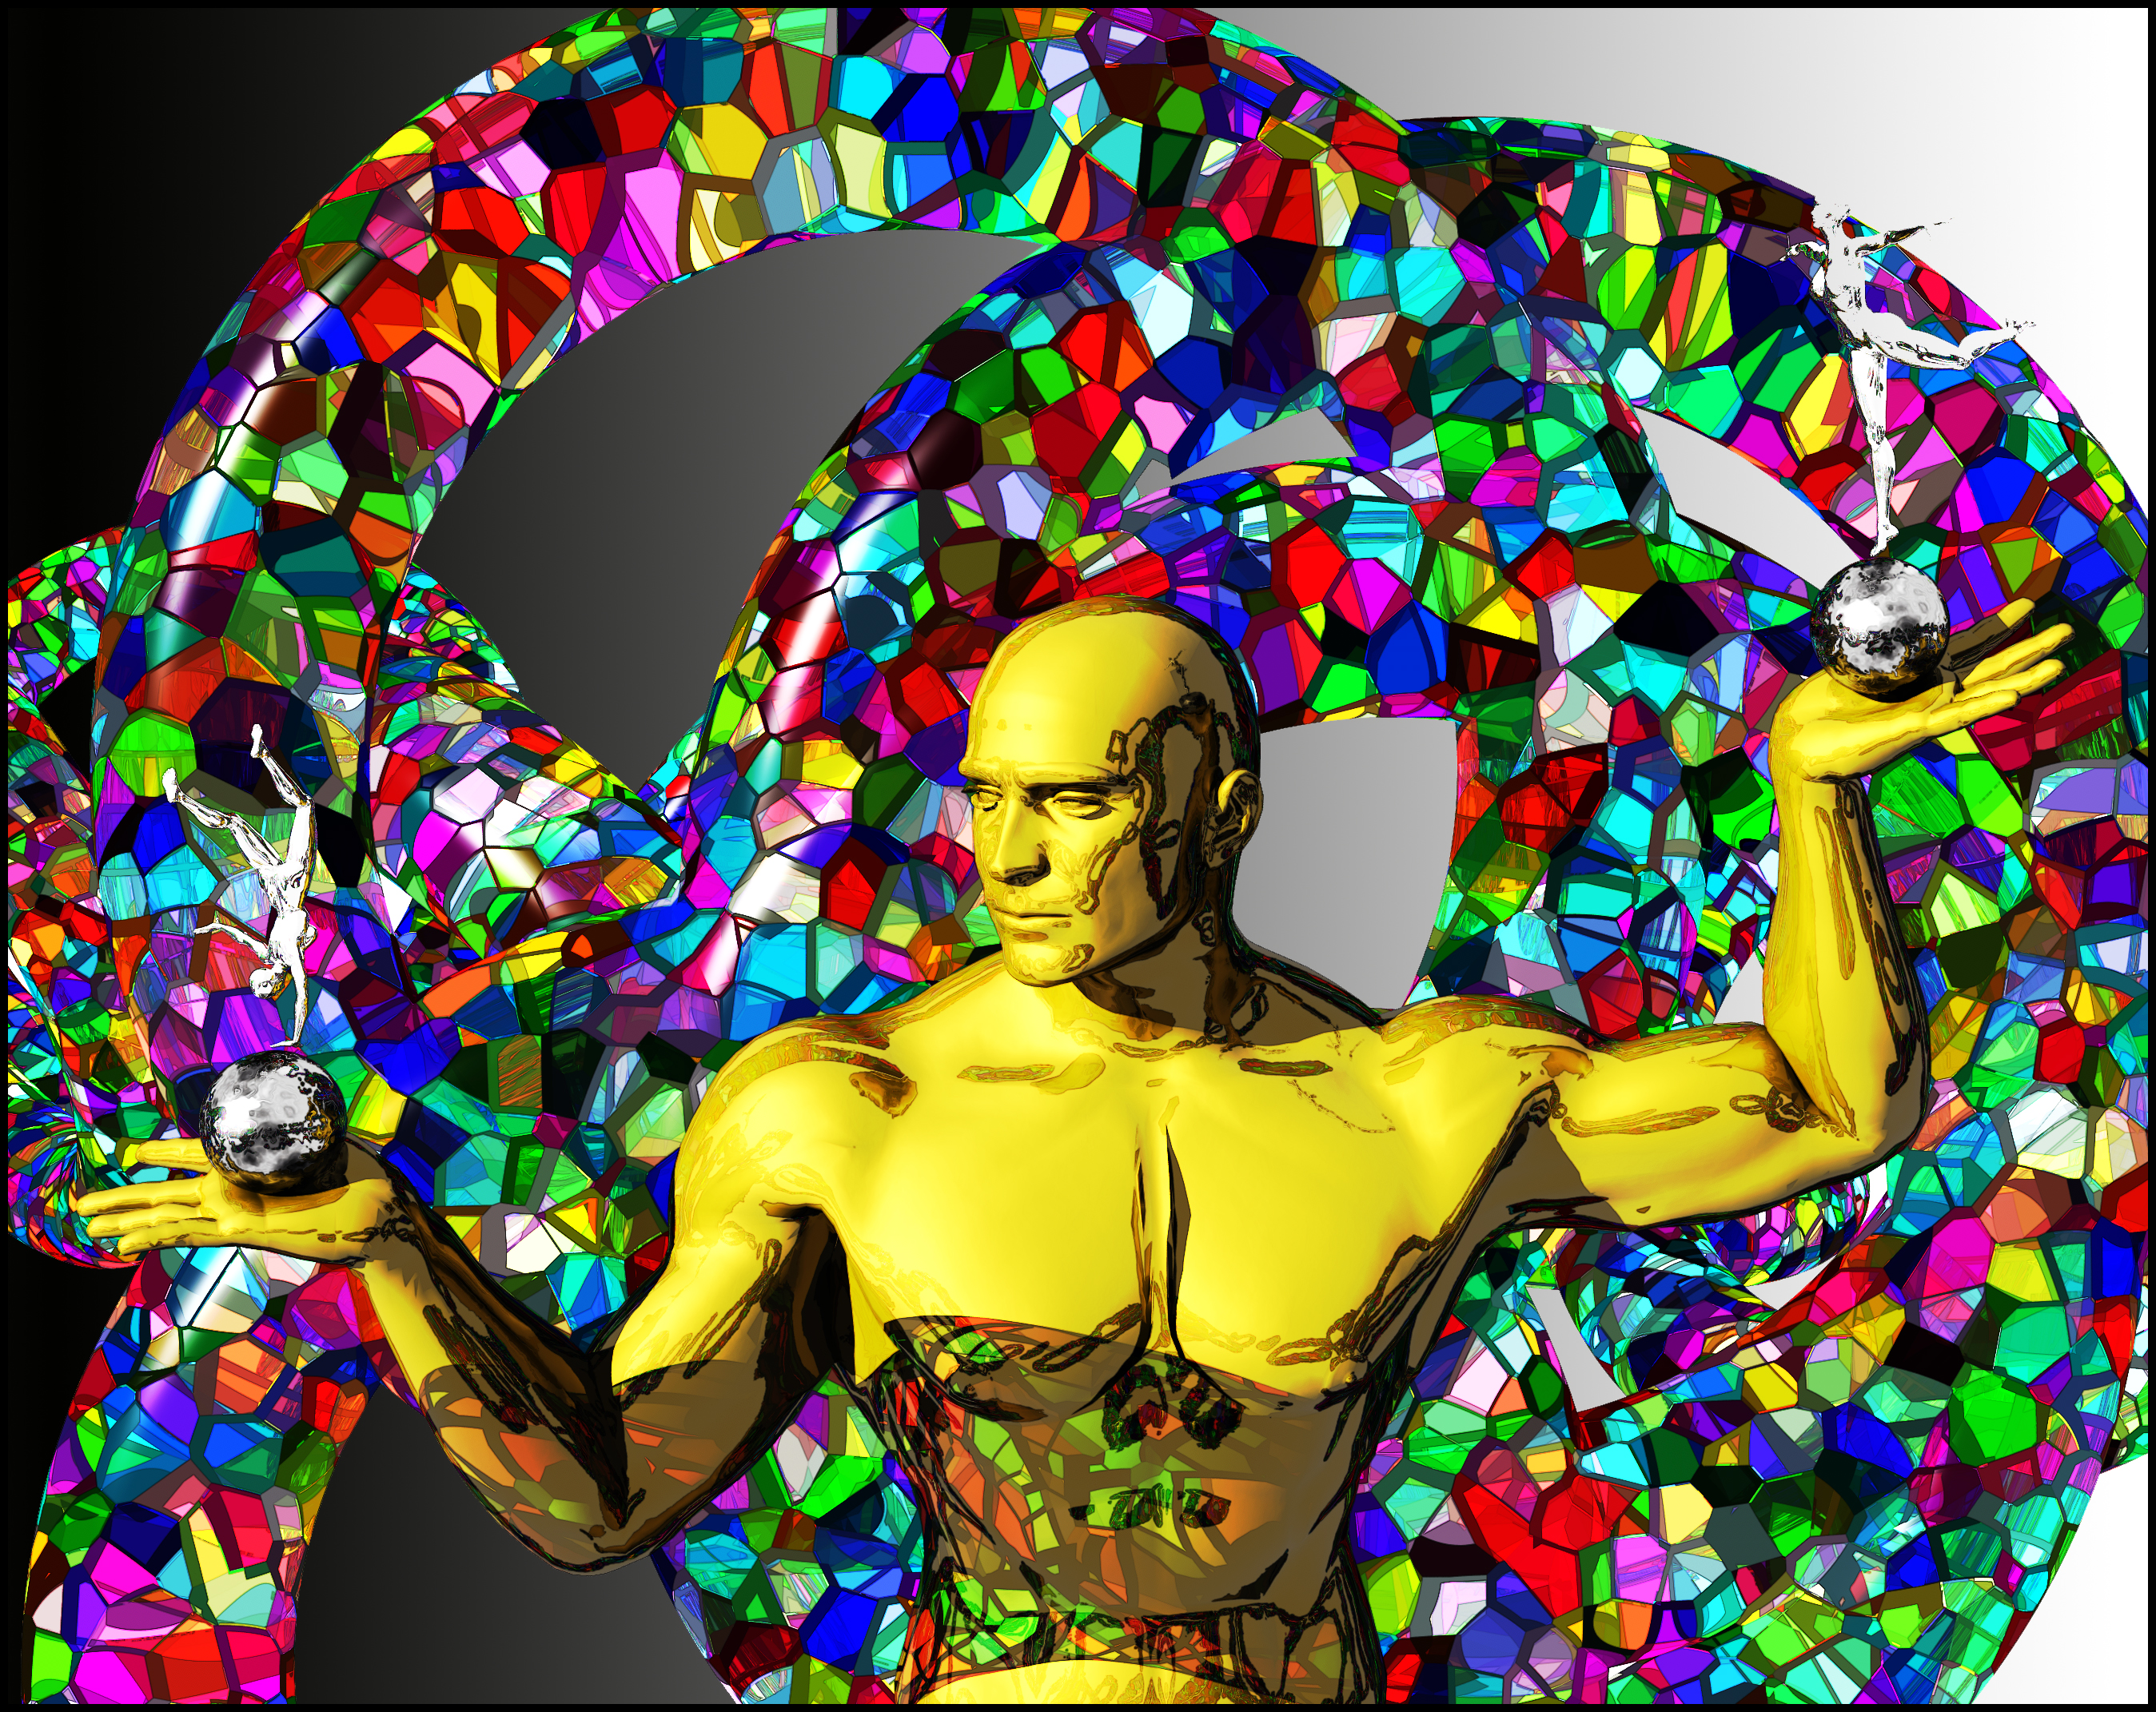 Metal Human - a Poser 90's image tribute